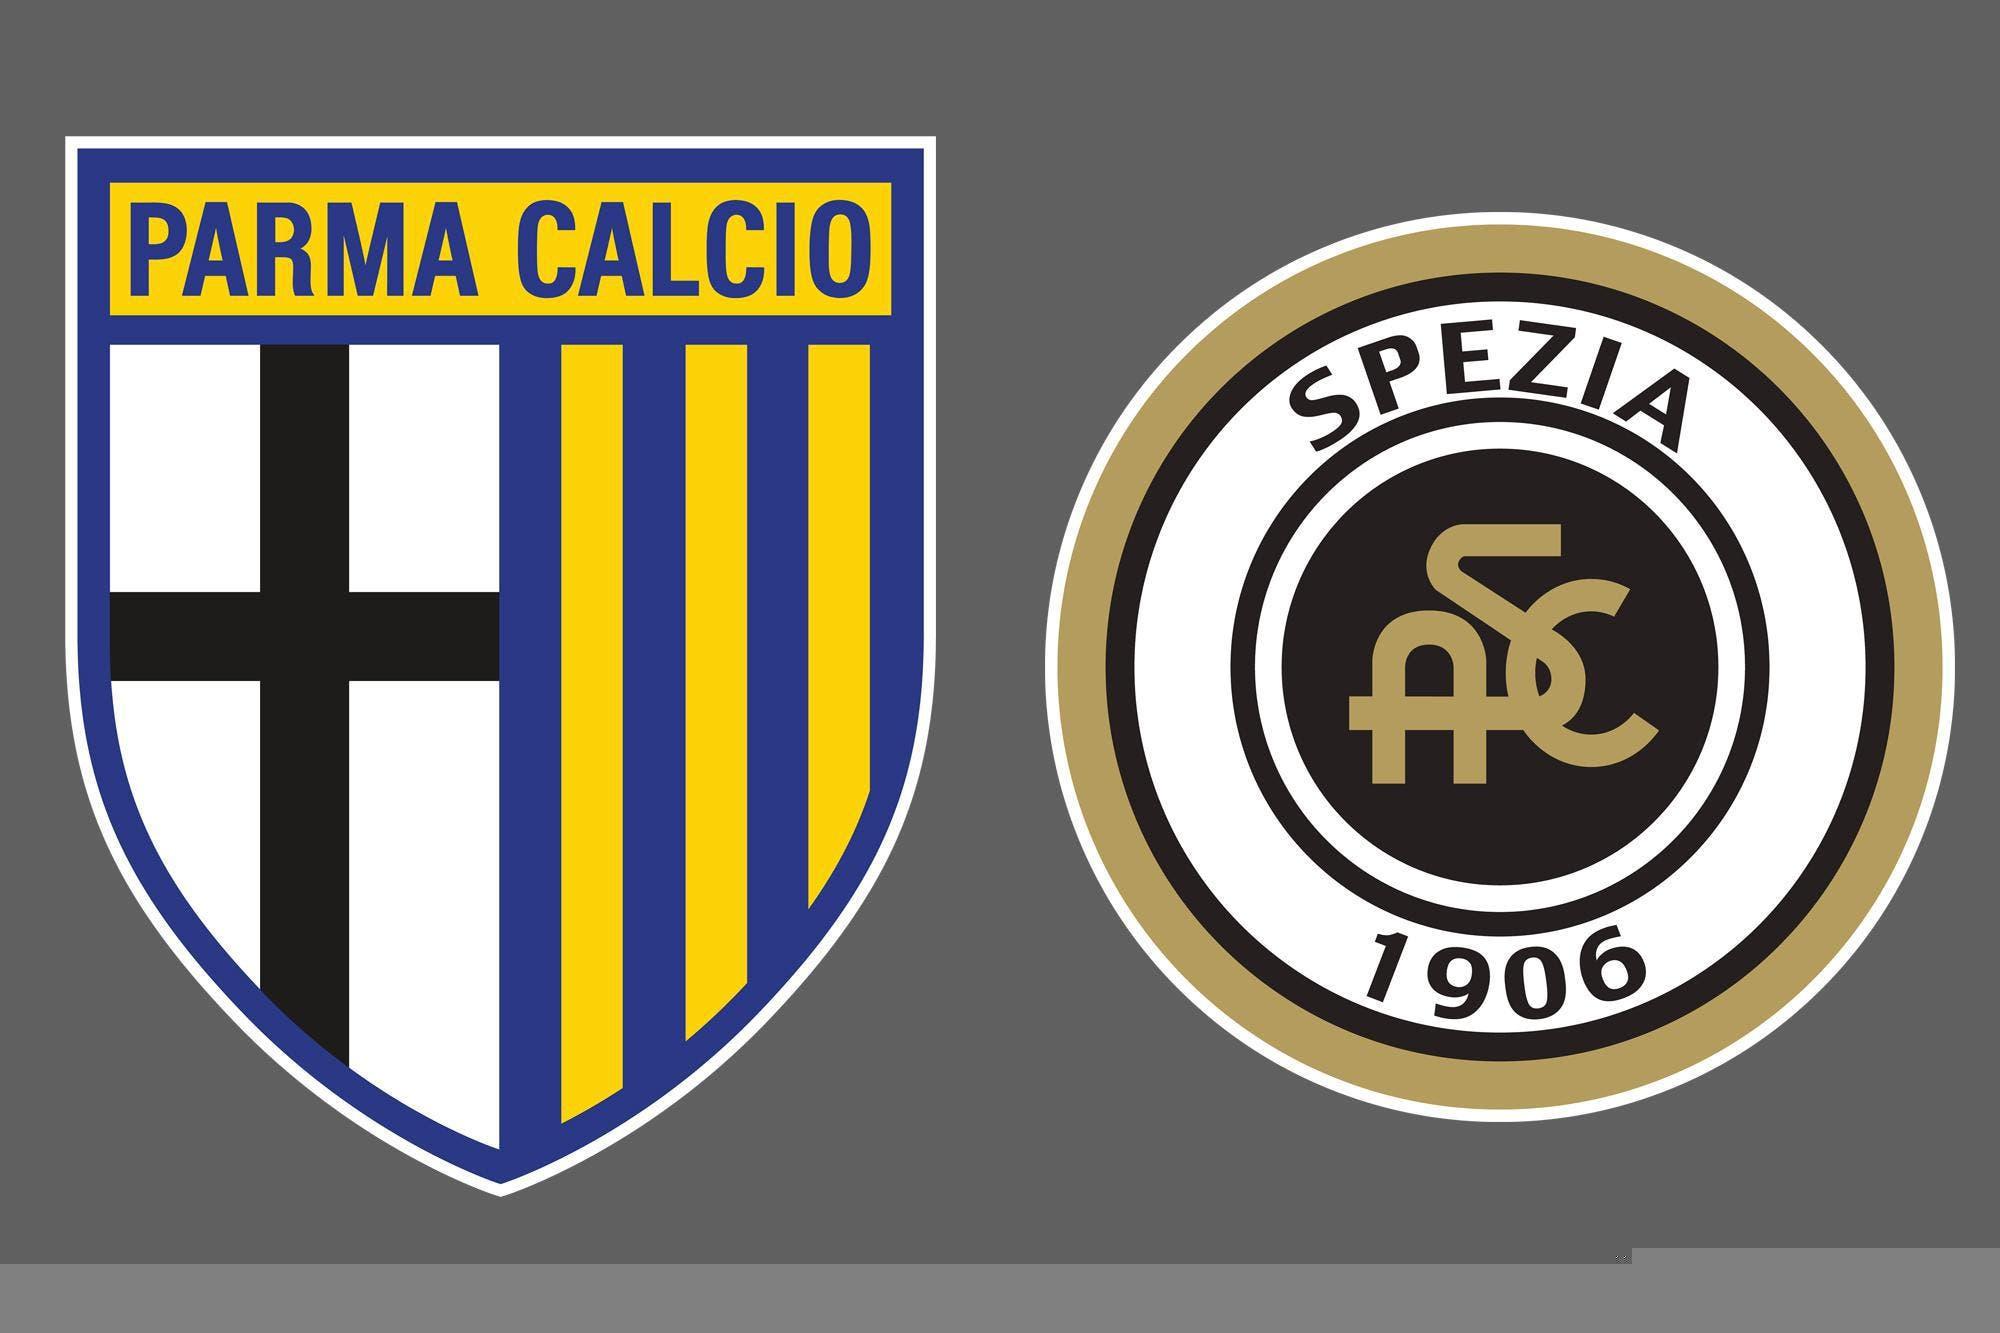 Serie A de Italia: Parma y Spezia empataron 2-2